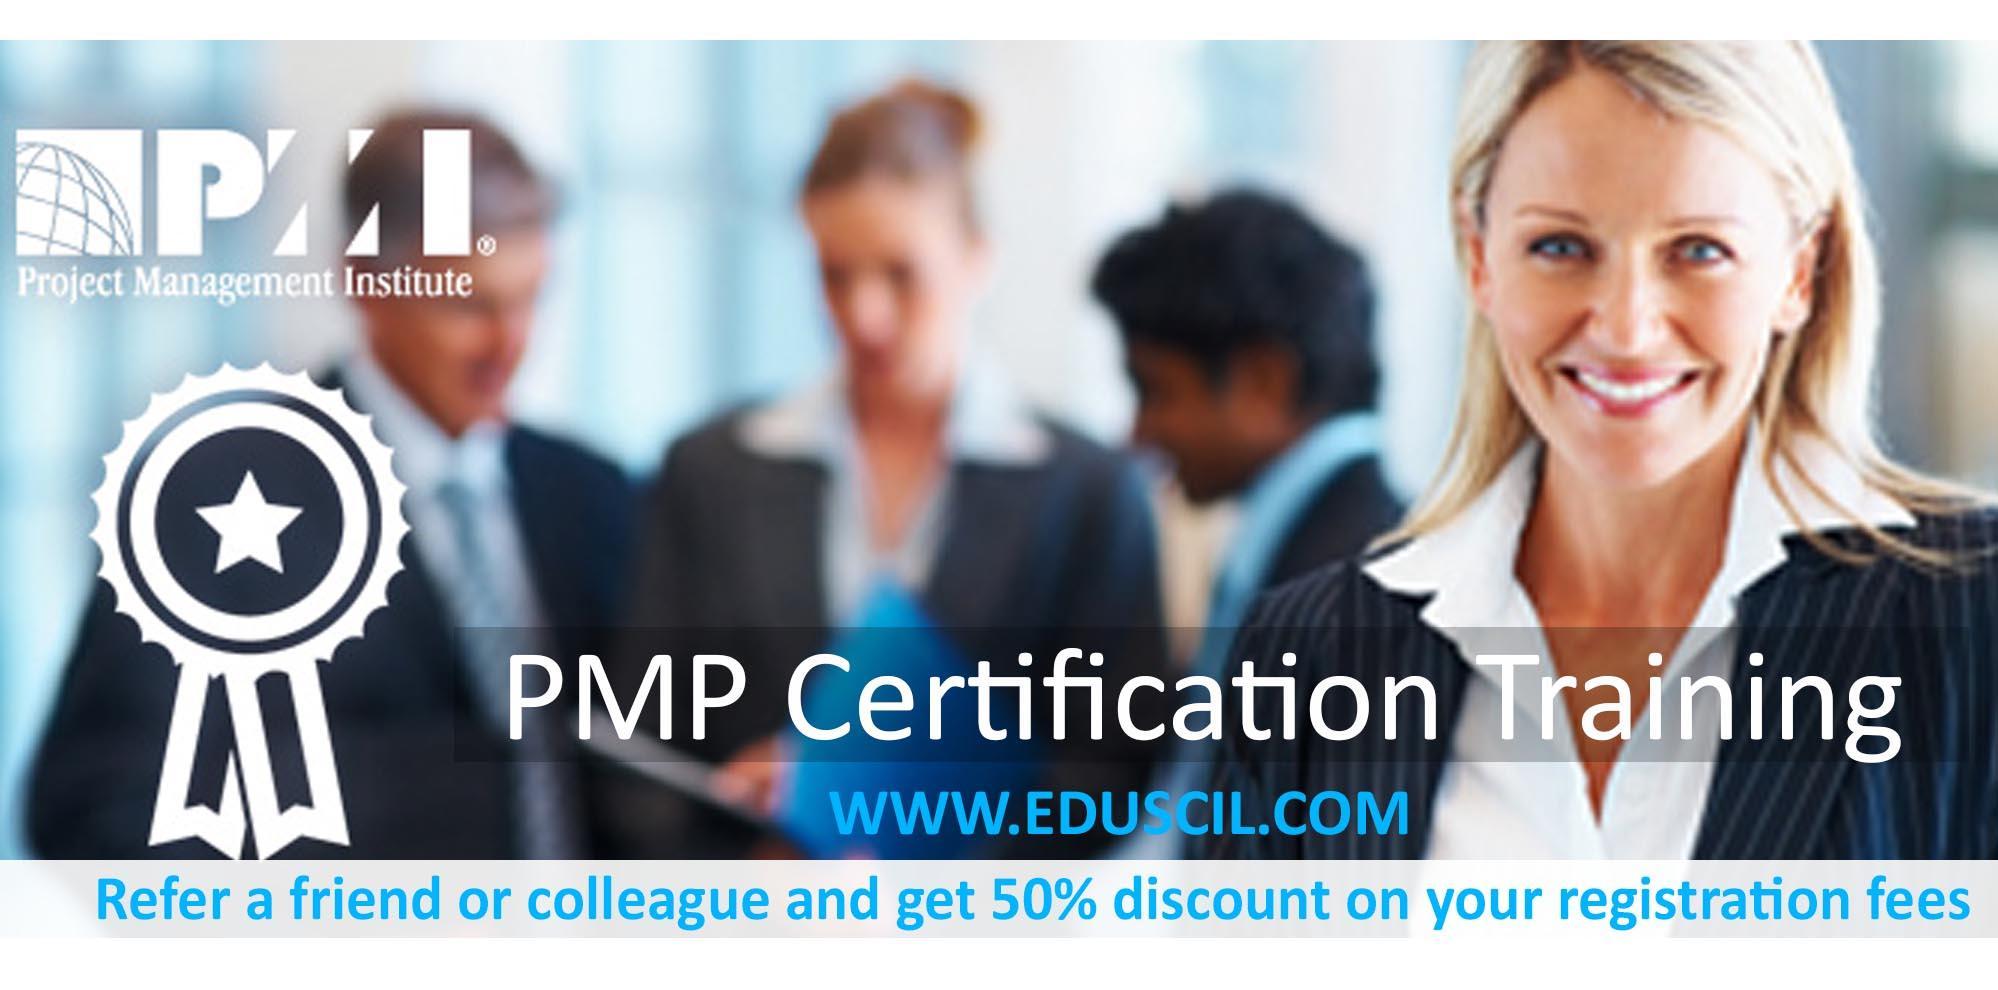 PMP® Certification Training Course in Birmingham, AL-USA | Eduscil